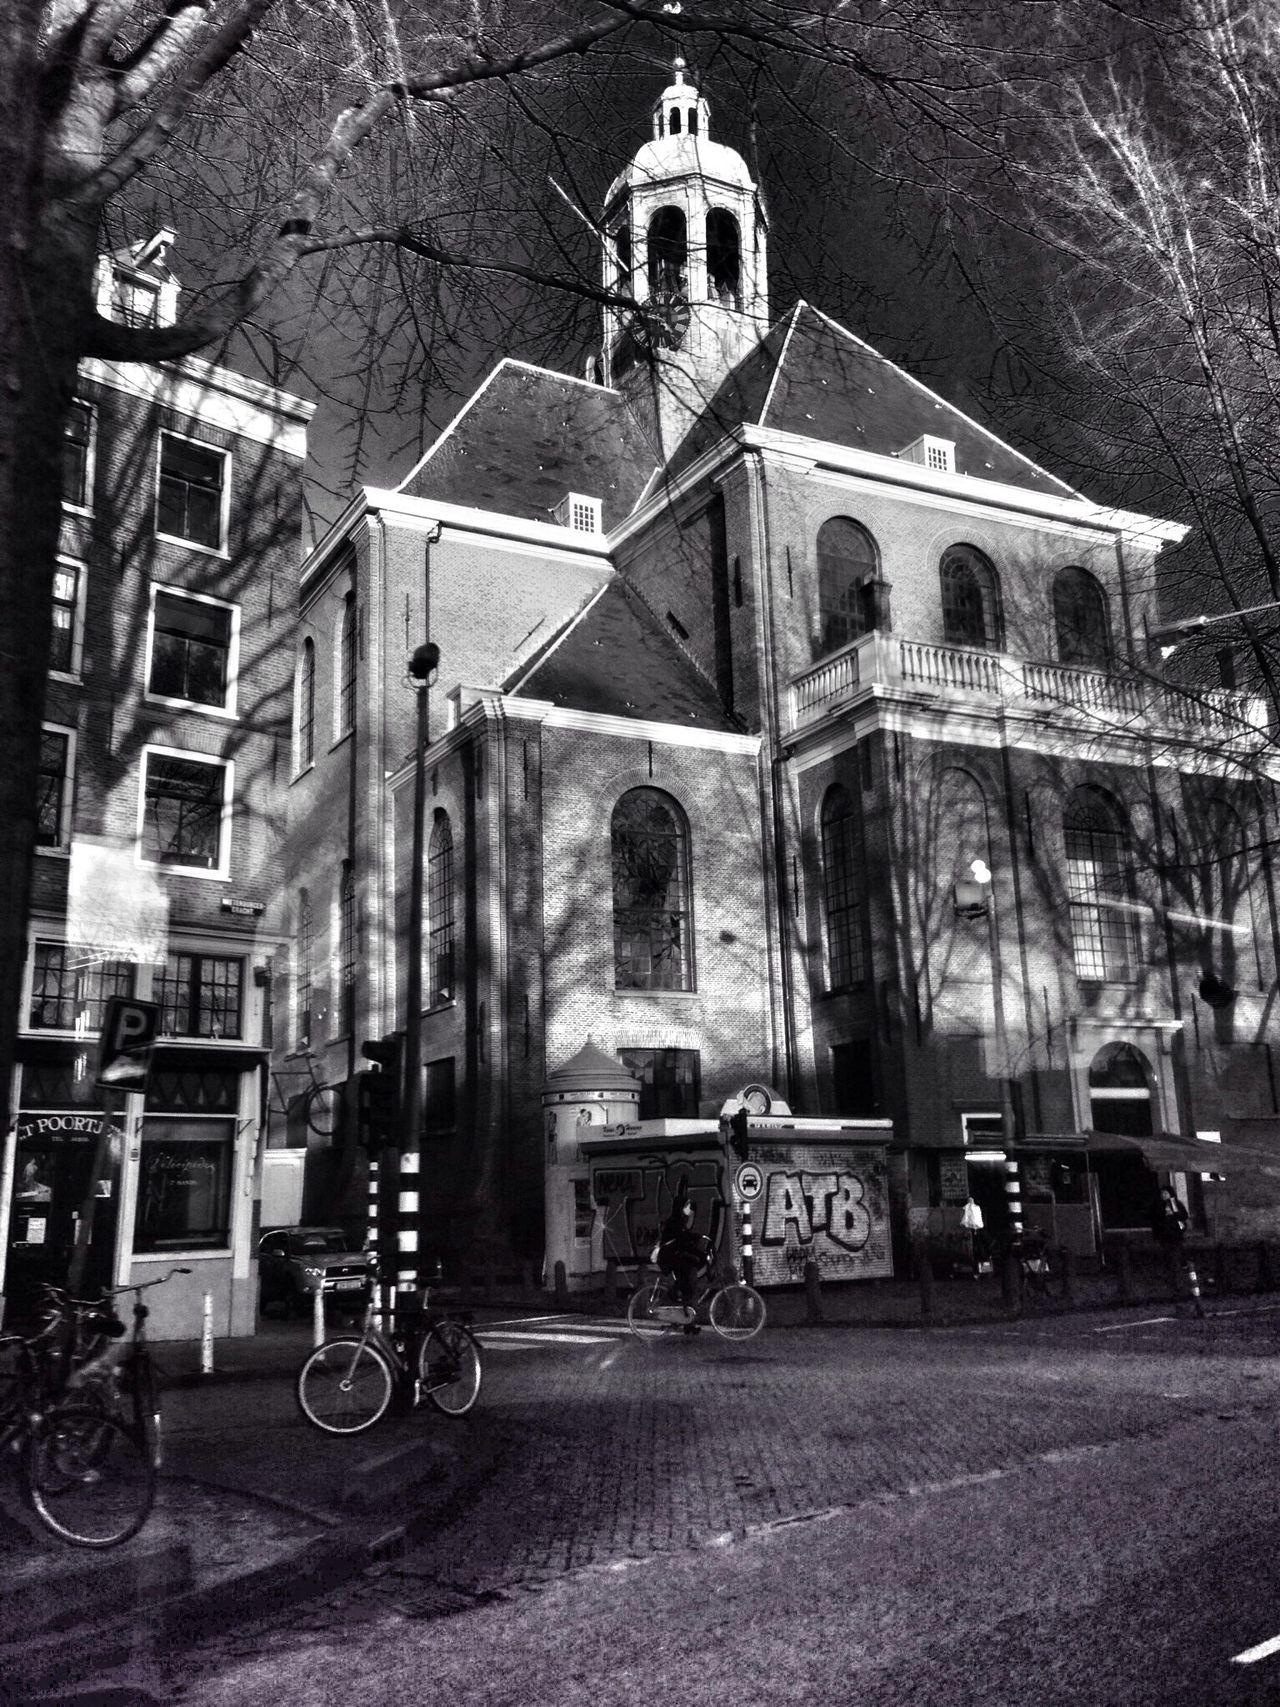 Amsterdam Amsterdam Streetphoto_bw Monochrome Photography The Architect - 2017 EyeEm Awards